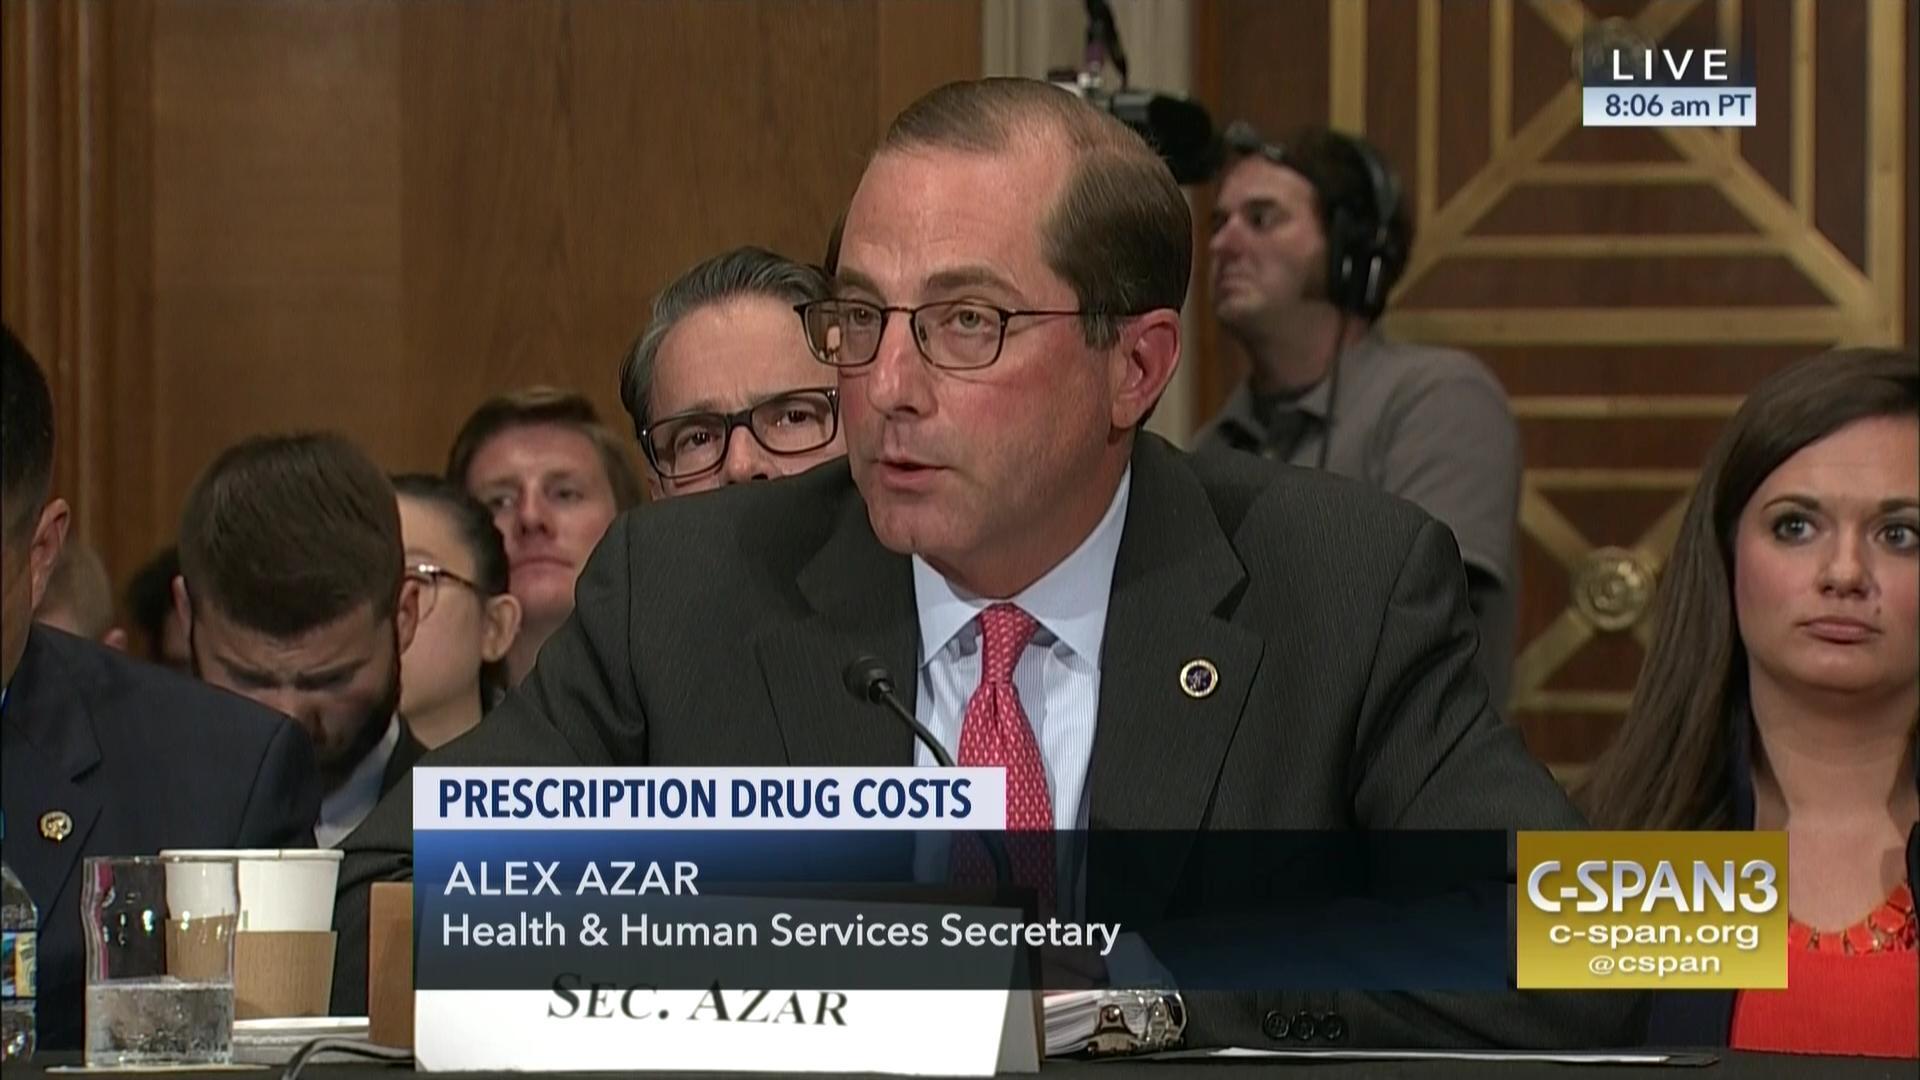 Senator burr suggesting longer monopolies reduce prices malvernweather Choice Image